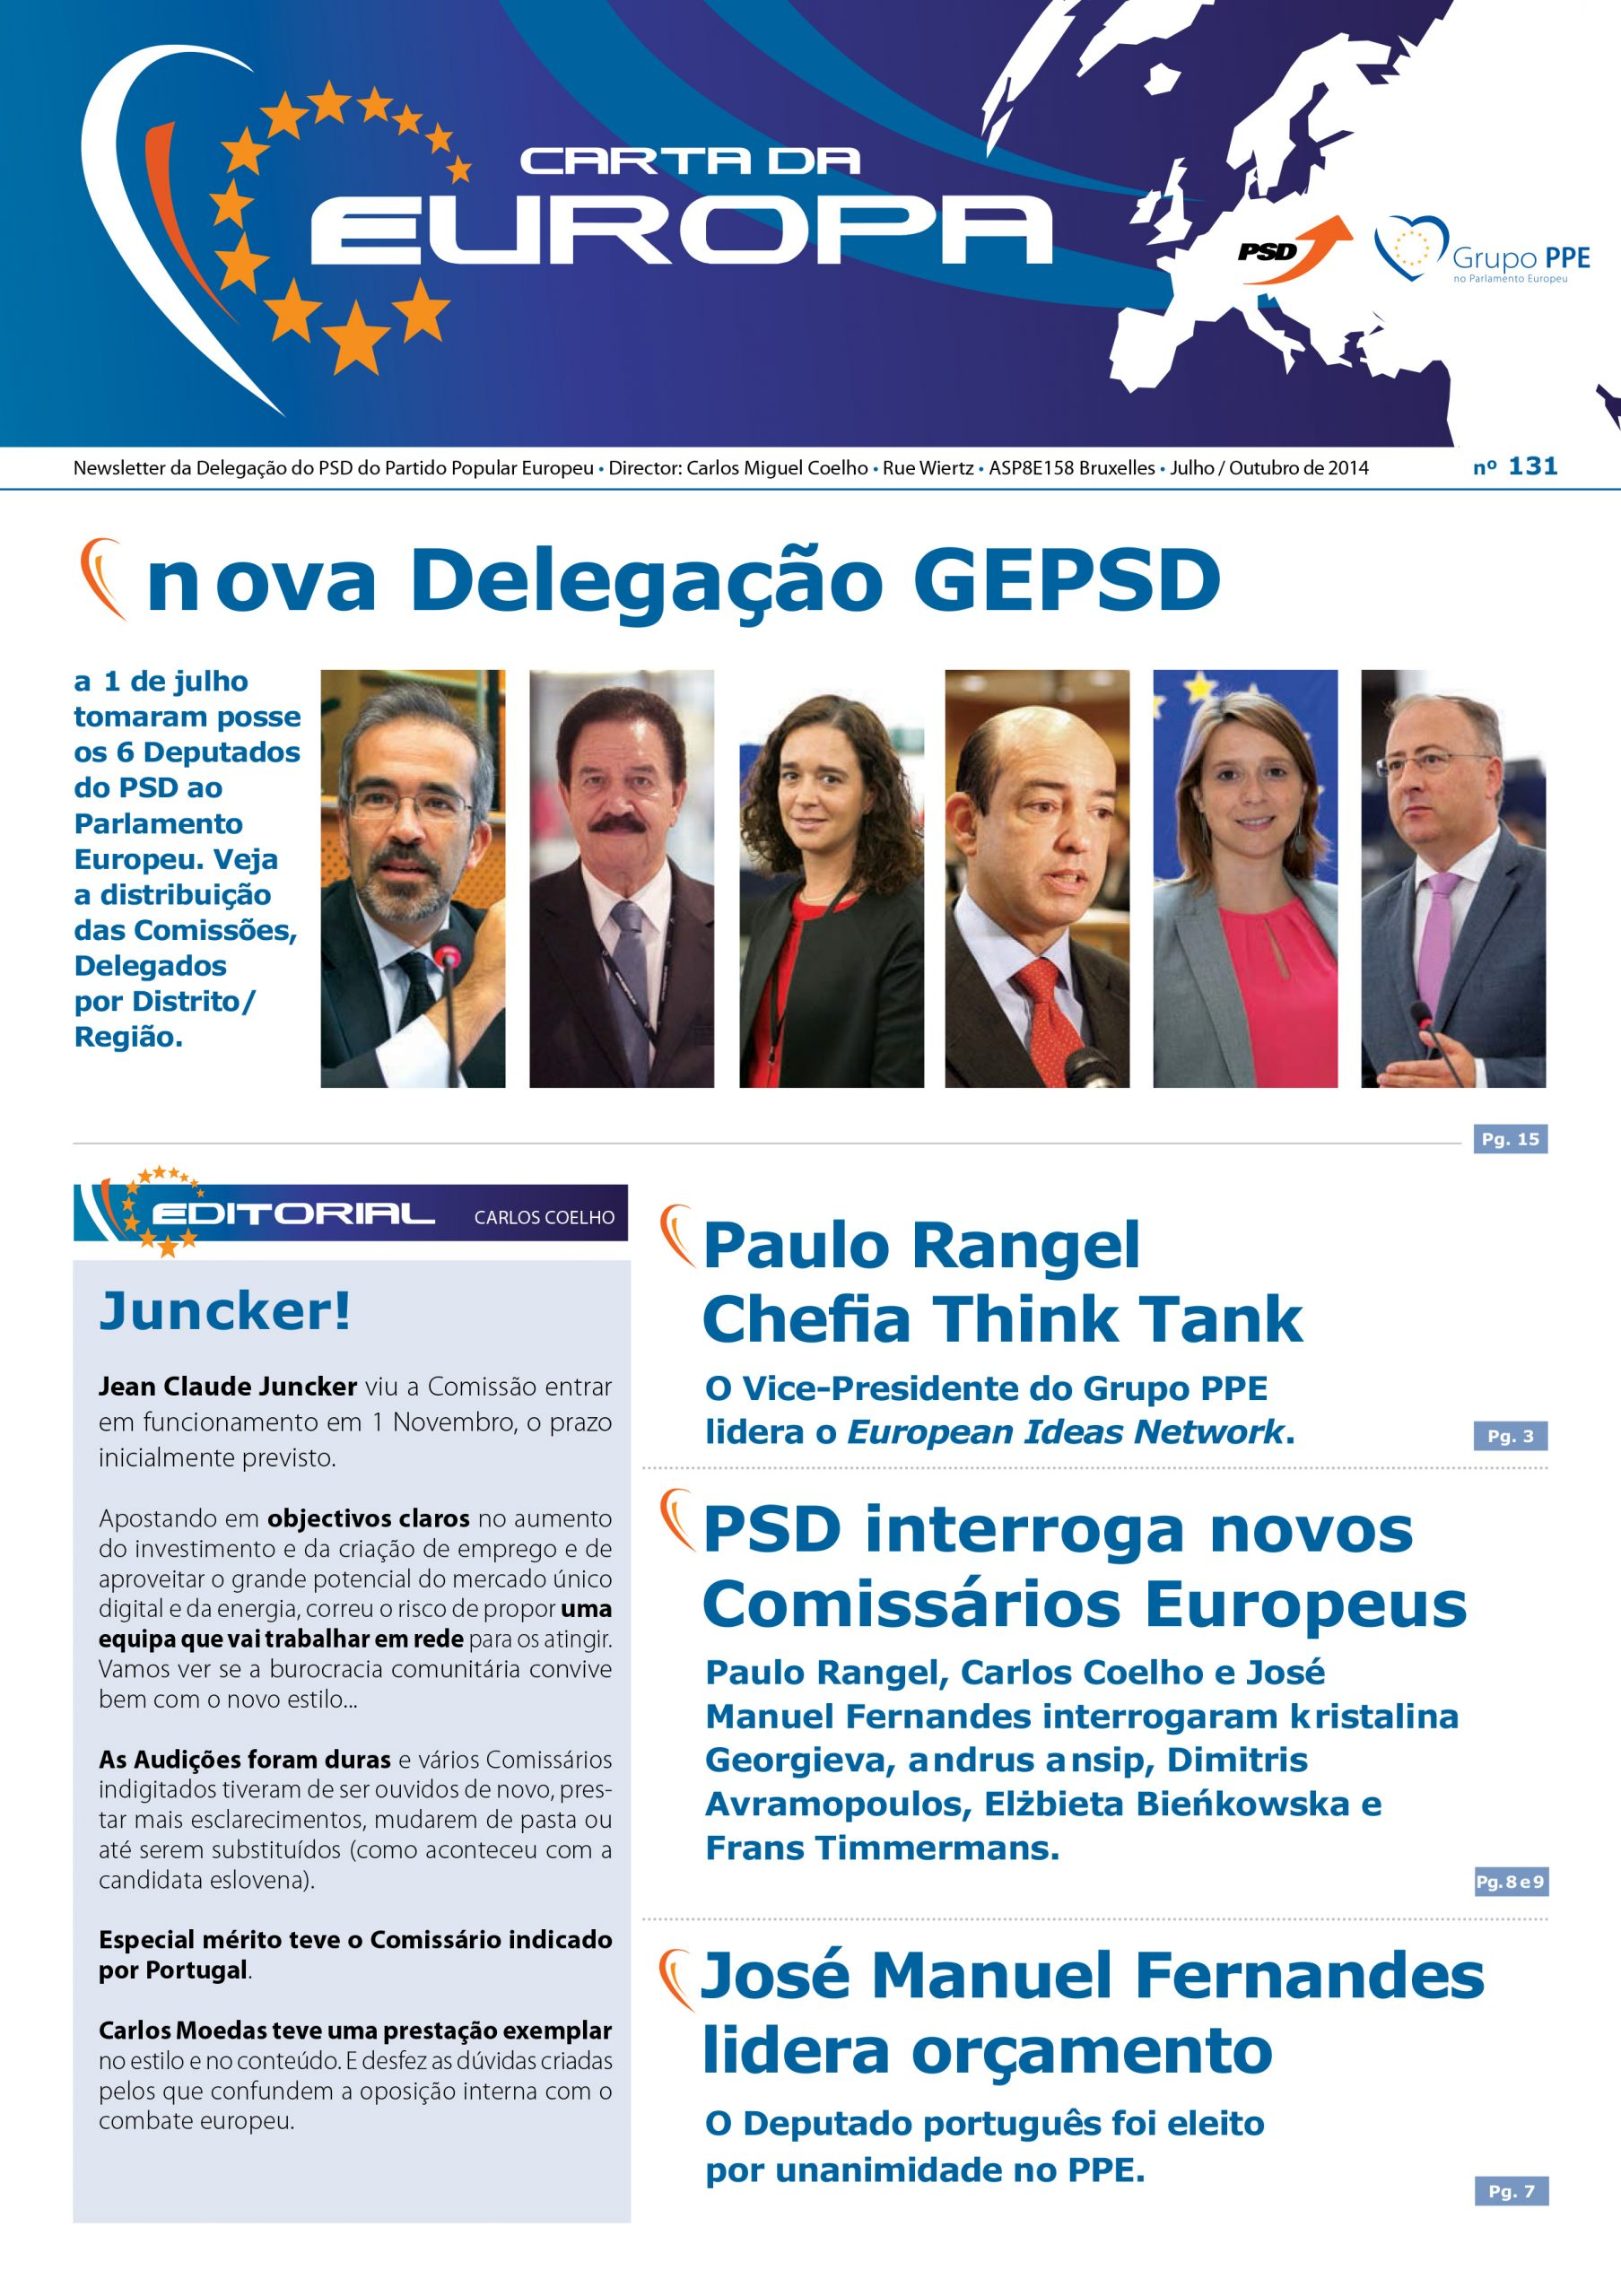 Carta da Europa Nº 131 July/October 2013